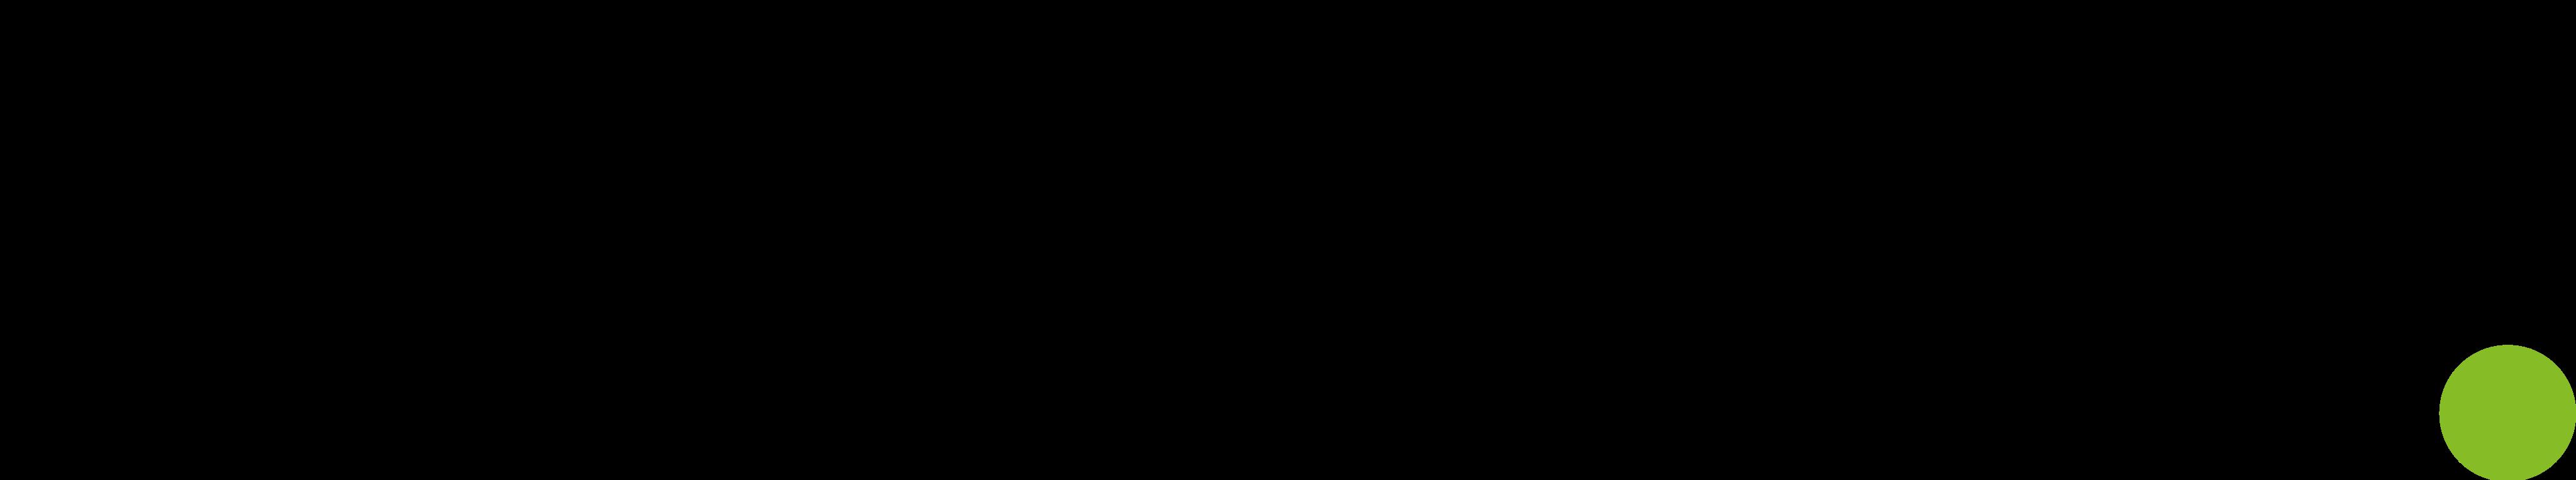 A36d980ce3dea116b535e0aab904790e28fc53c4